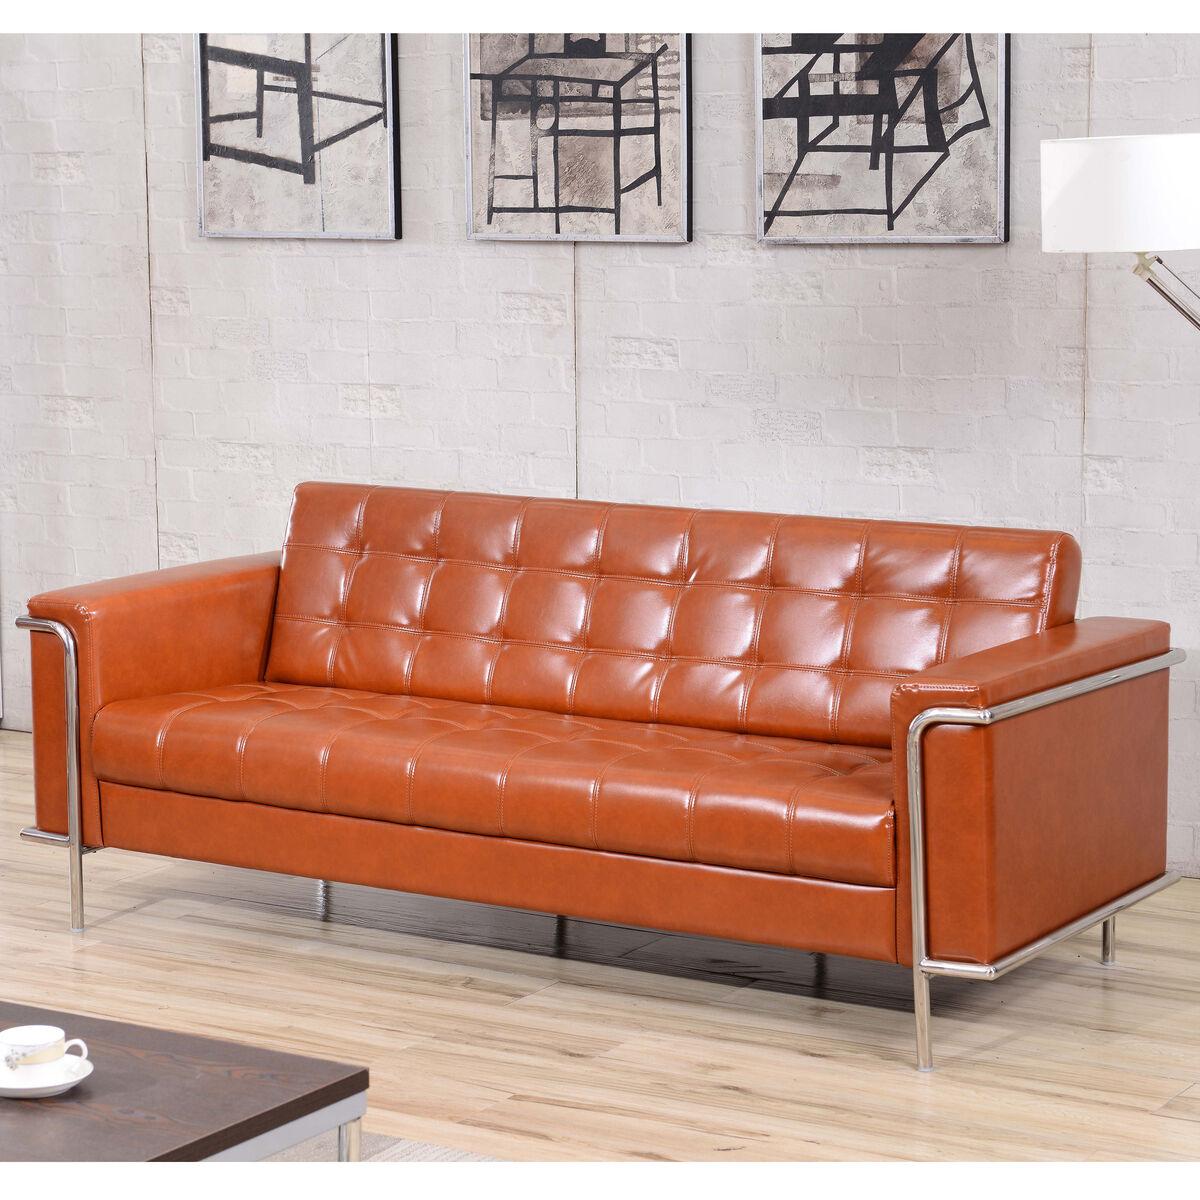 Art Wohndesign: Flash Furniture ZB-LESLEY-8090-SOFA-COG-GG